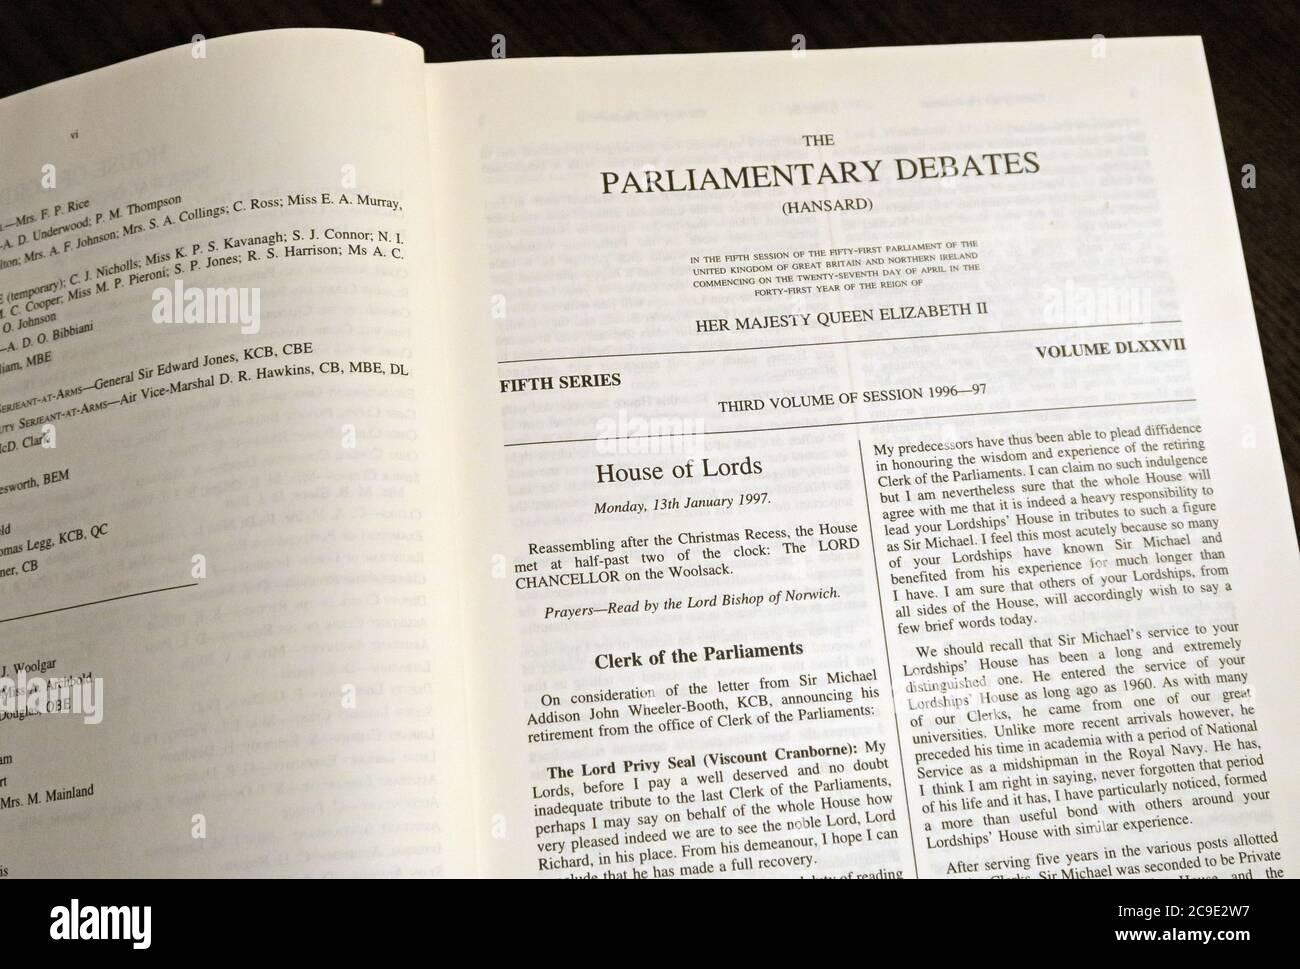 Dieses Stockfoto: Offizieller Bericht, Parlamentsdebatten, The House of Lords , Hansard , Vol 545, Westminster , London, England, Großbritannien, Bücher, Bände - 2C9E2W